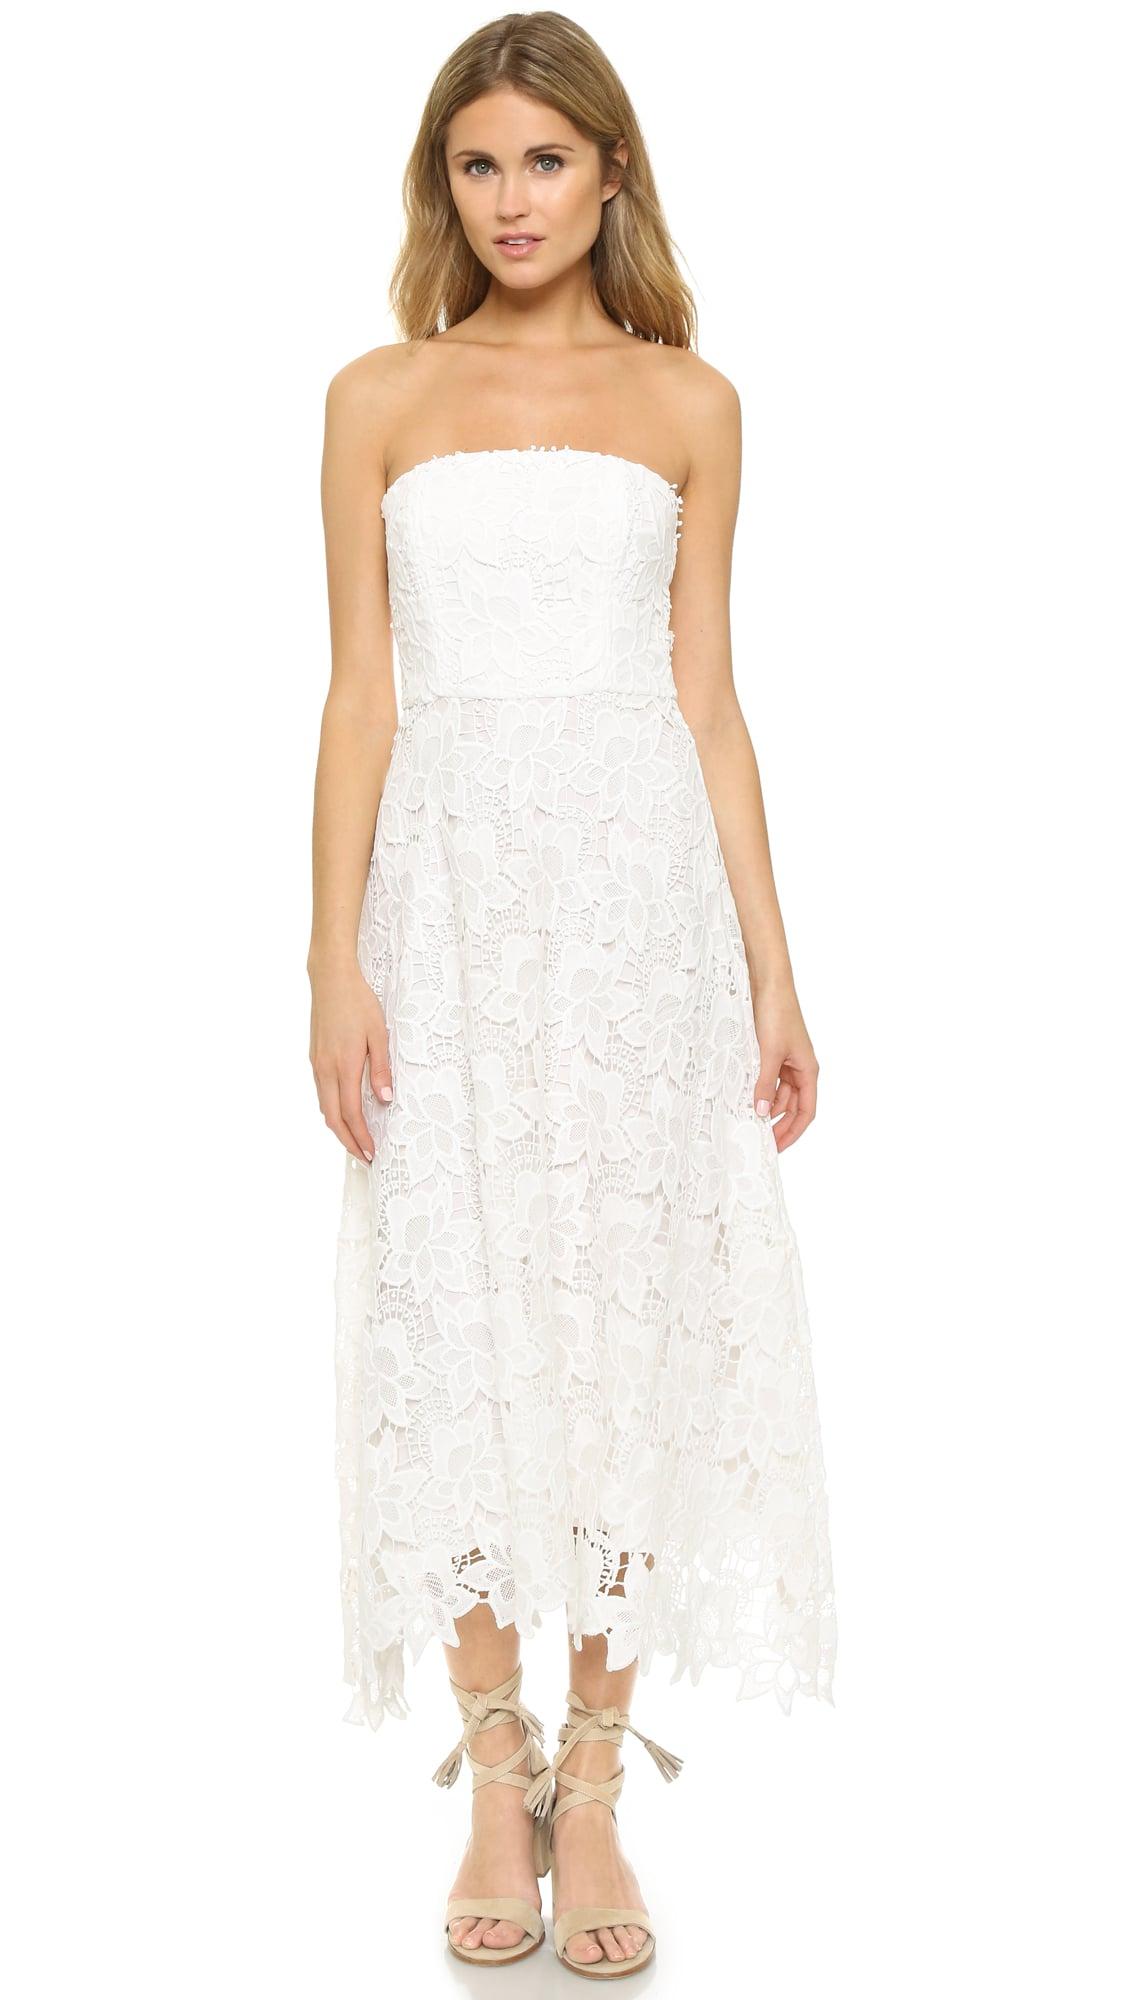 Bb Dakota Eleanor Strapless Lace Midi Dress 114 The